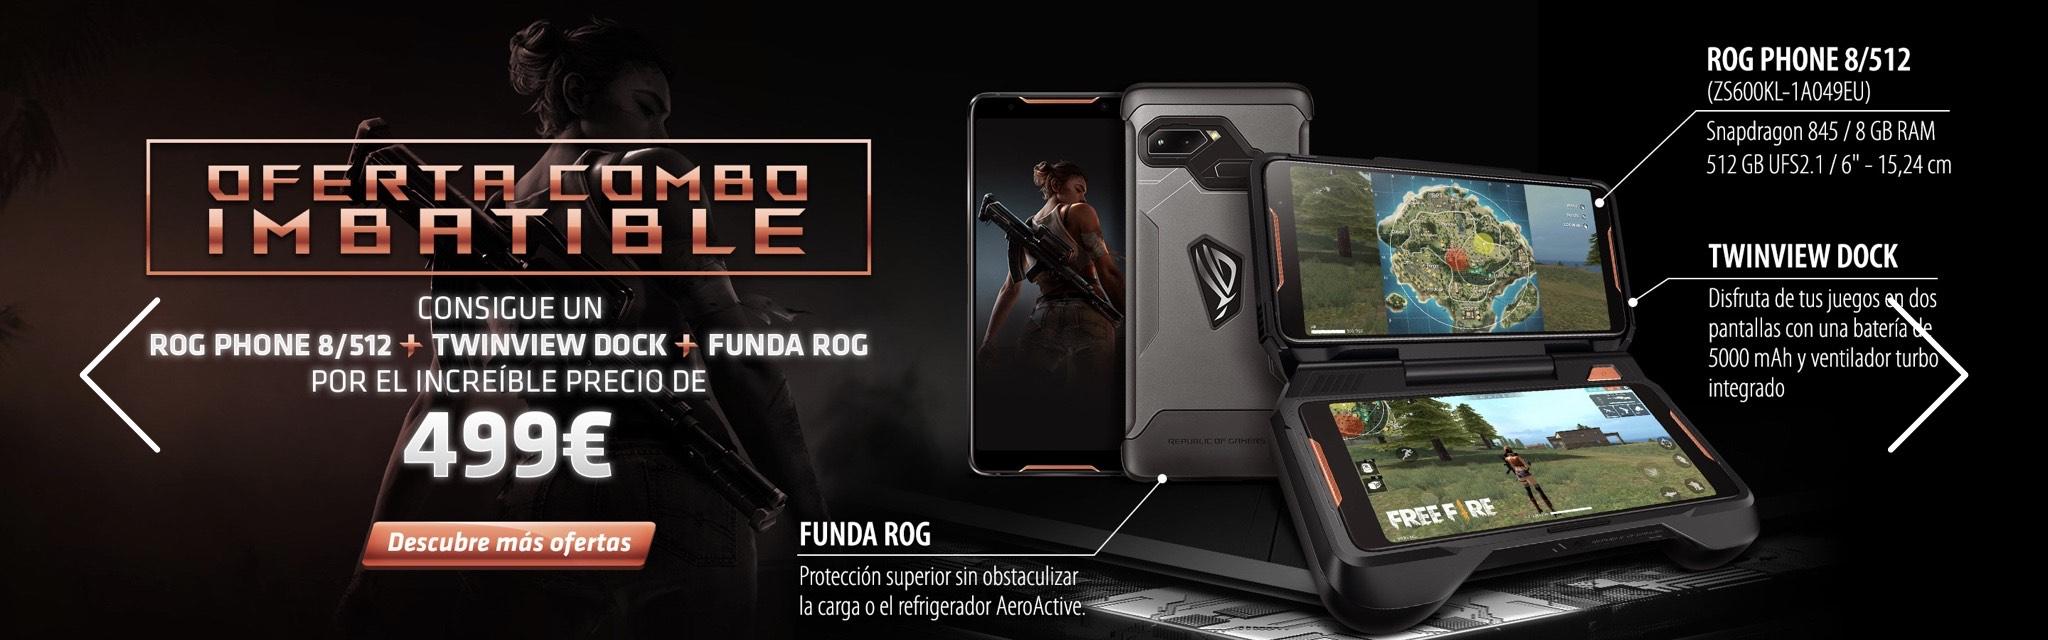 ASUS Rog Phone 512 gb + TwinView + Funda